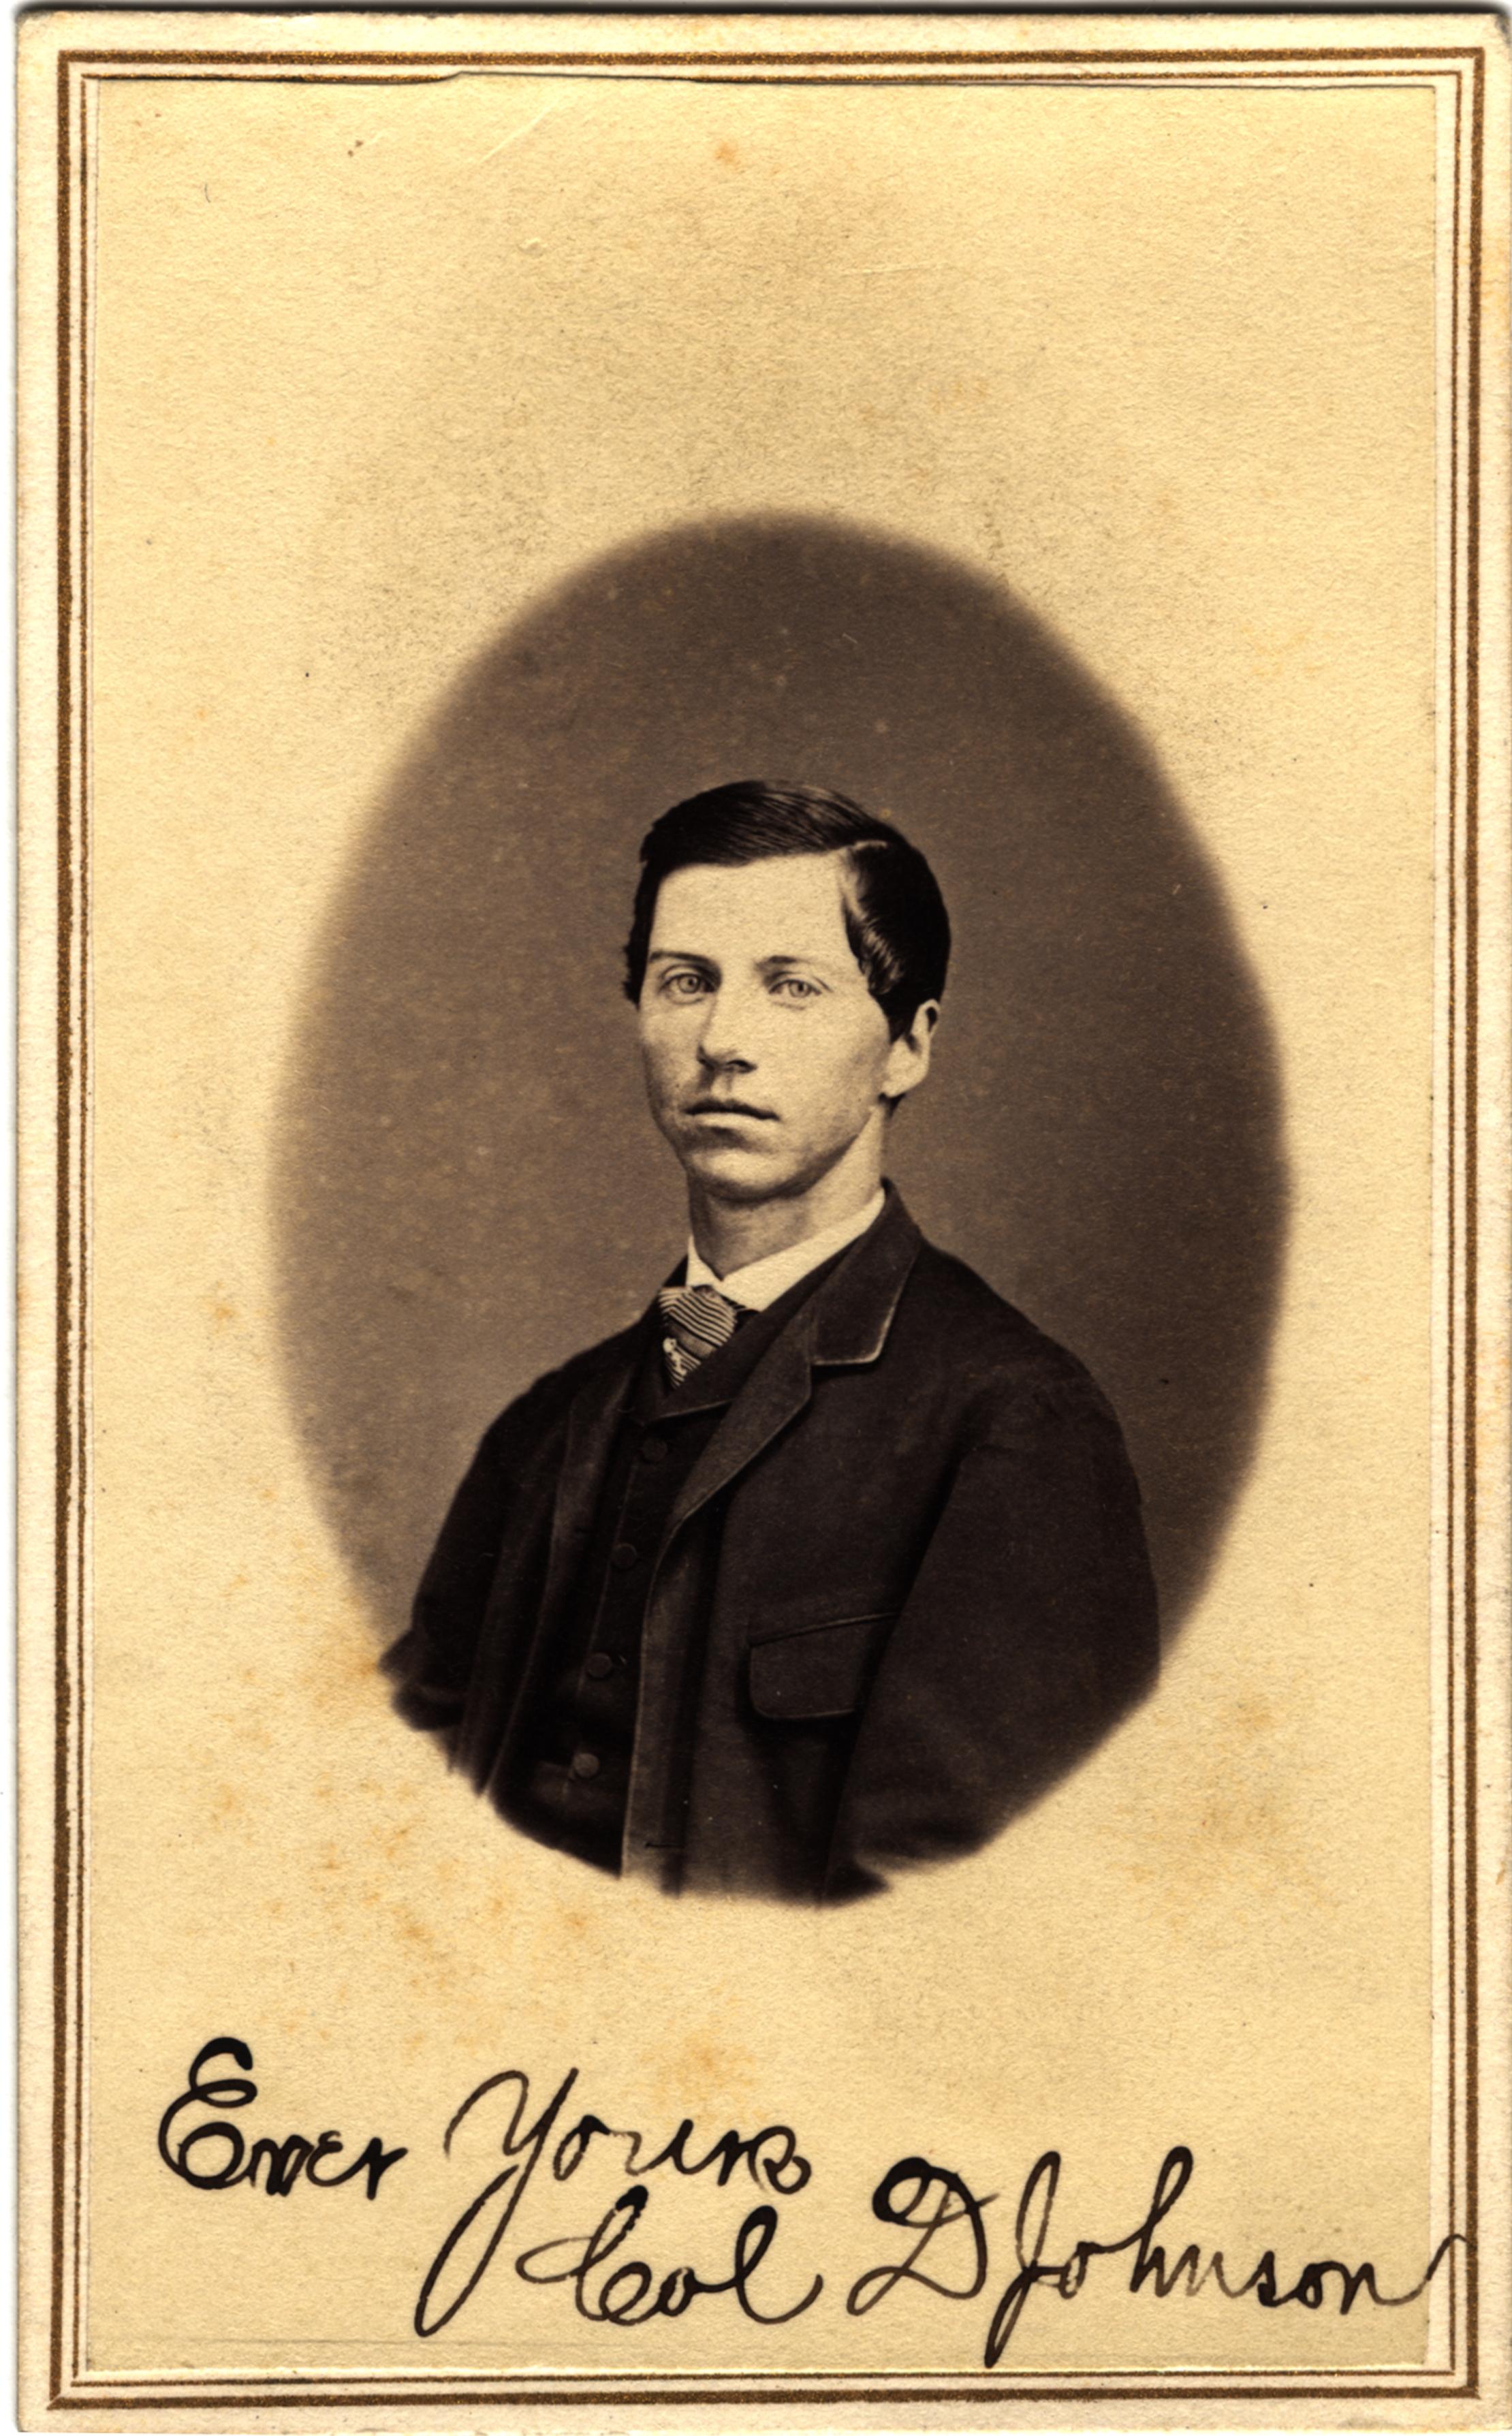 Col. D. Johnson, circa 1860s